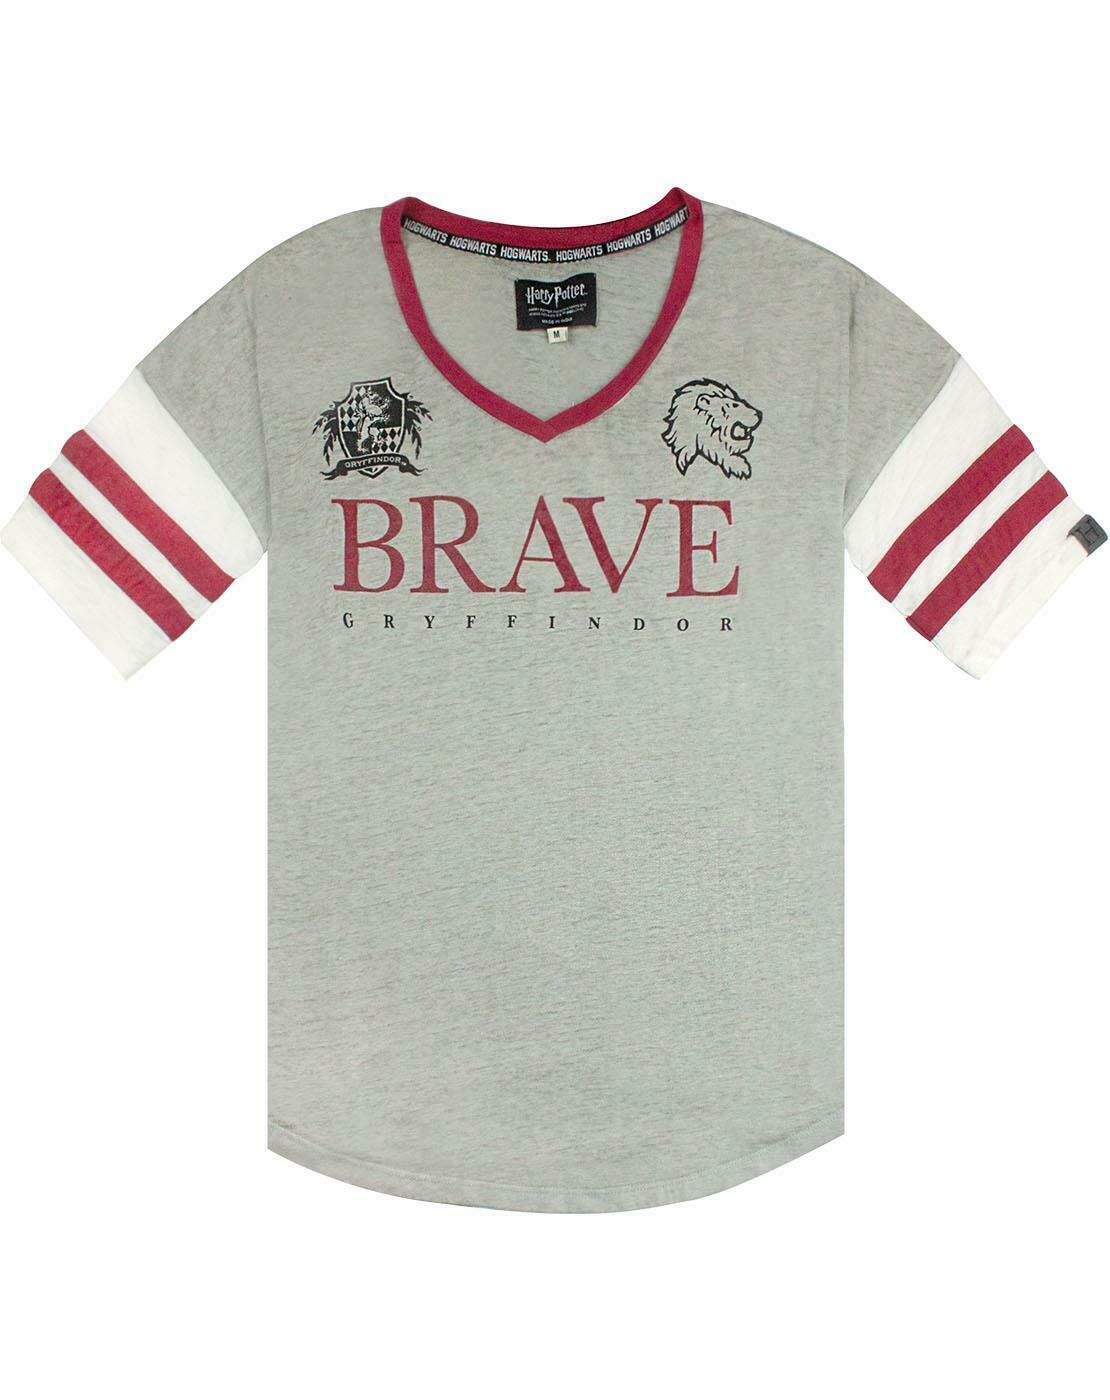 Harry-Potter-Gryffindor-valiente-mujer-dama-Varsity-Camiseta-Tallas-S-XL miniatura 11